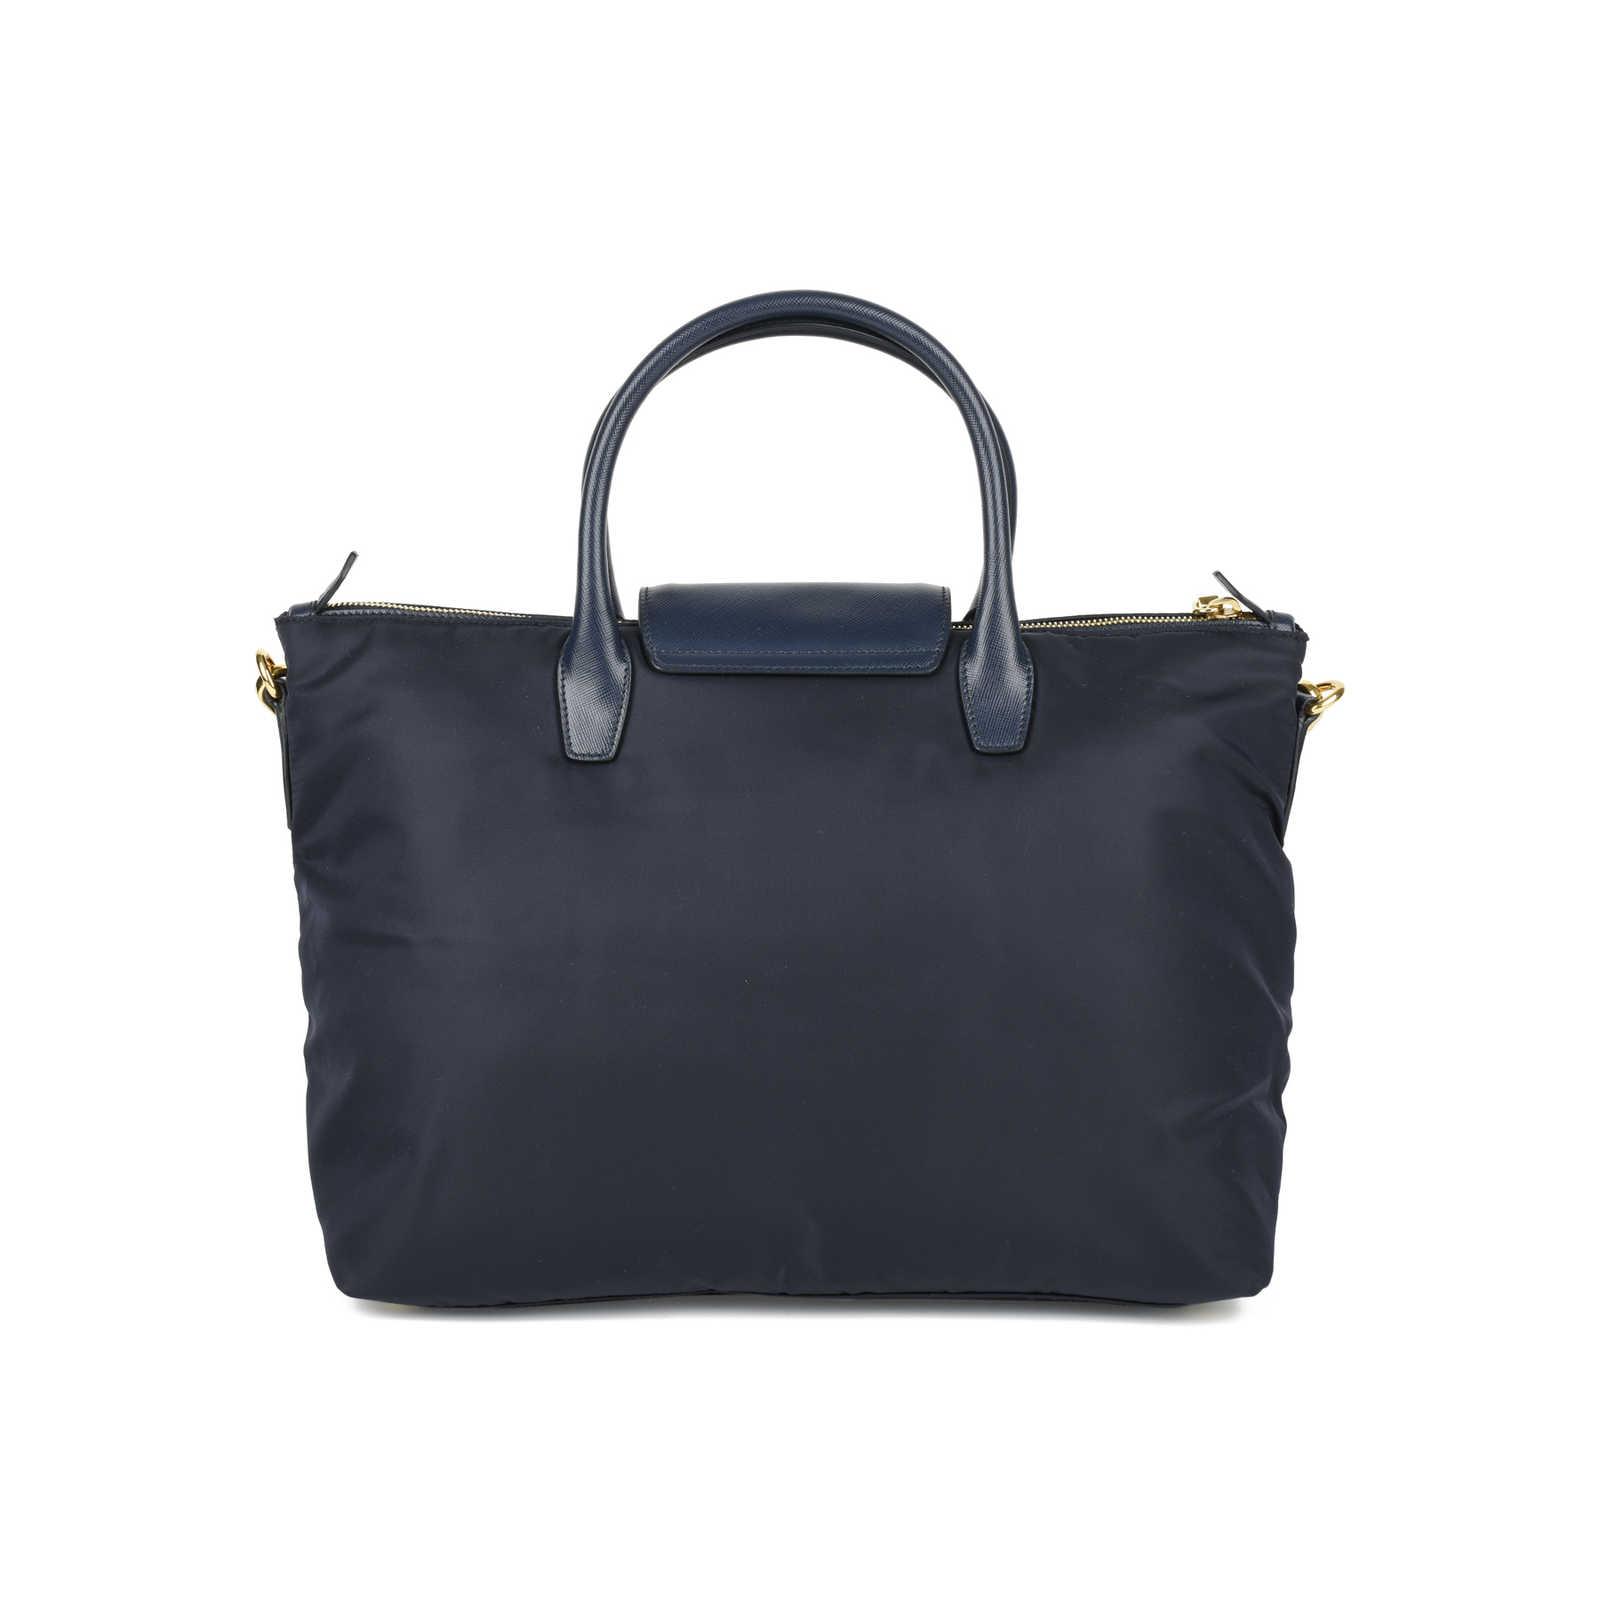 82a99b612f3b ... Authentic Second Hand Prada Tessuto Saffiano Tote Bag (PSS-446-00005)  ...